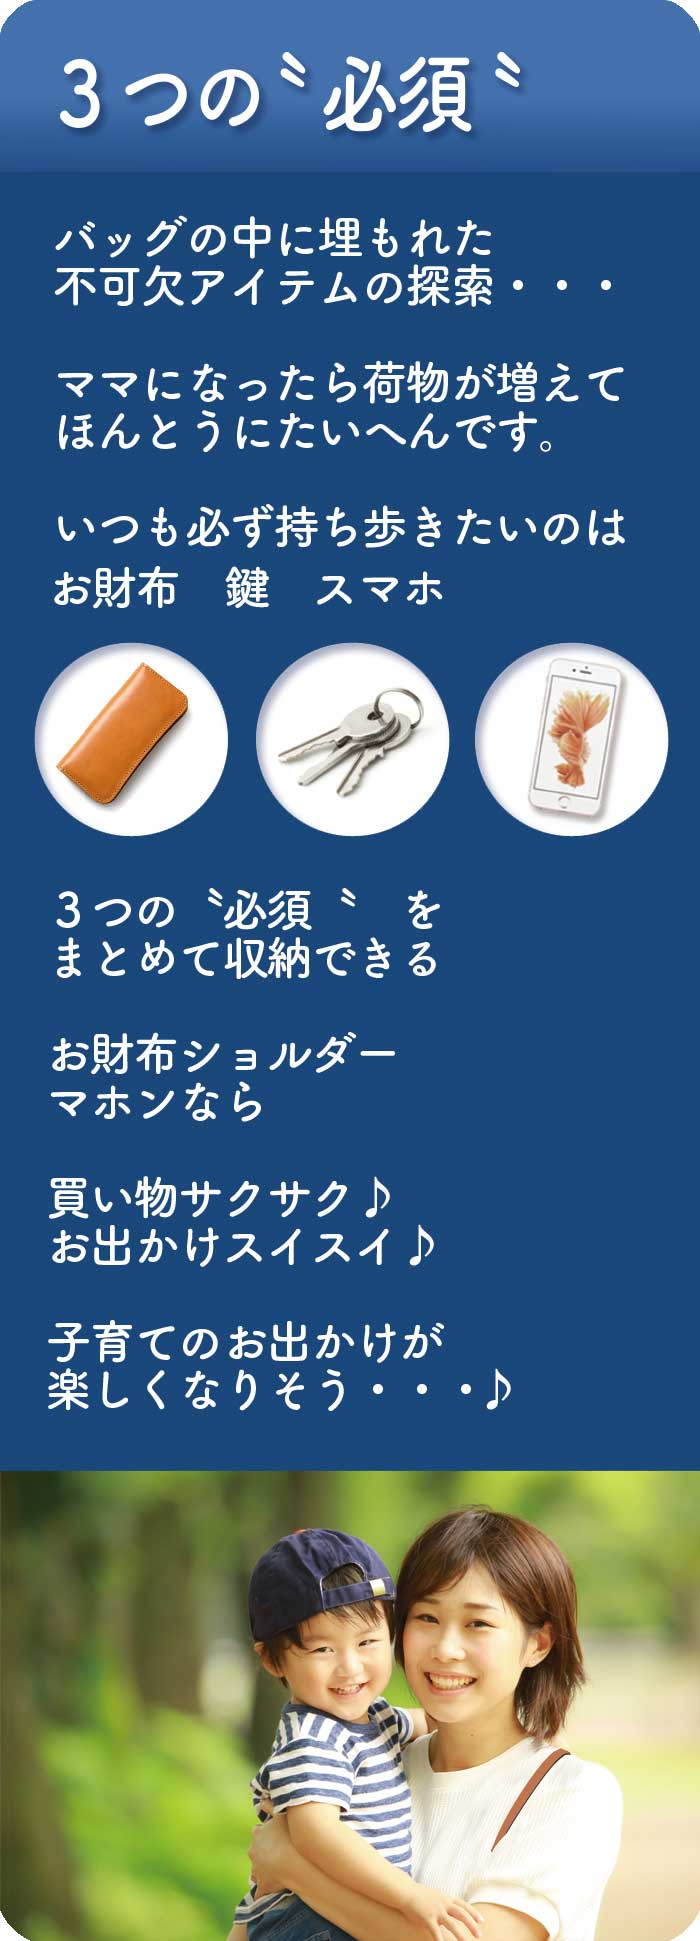 3 Tu hissuu02 - 幸せ♪♪ ビュッフェ